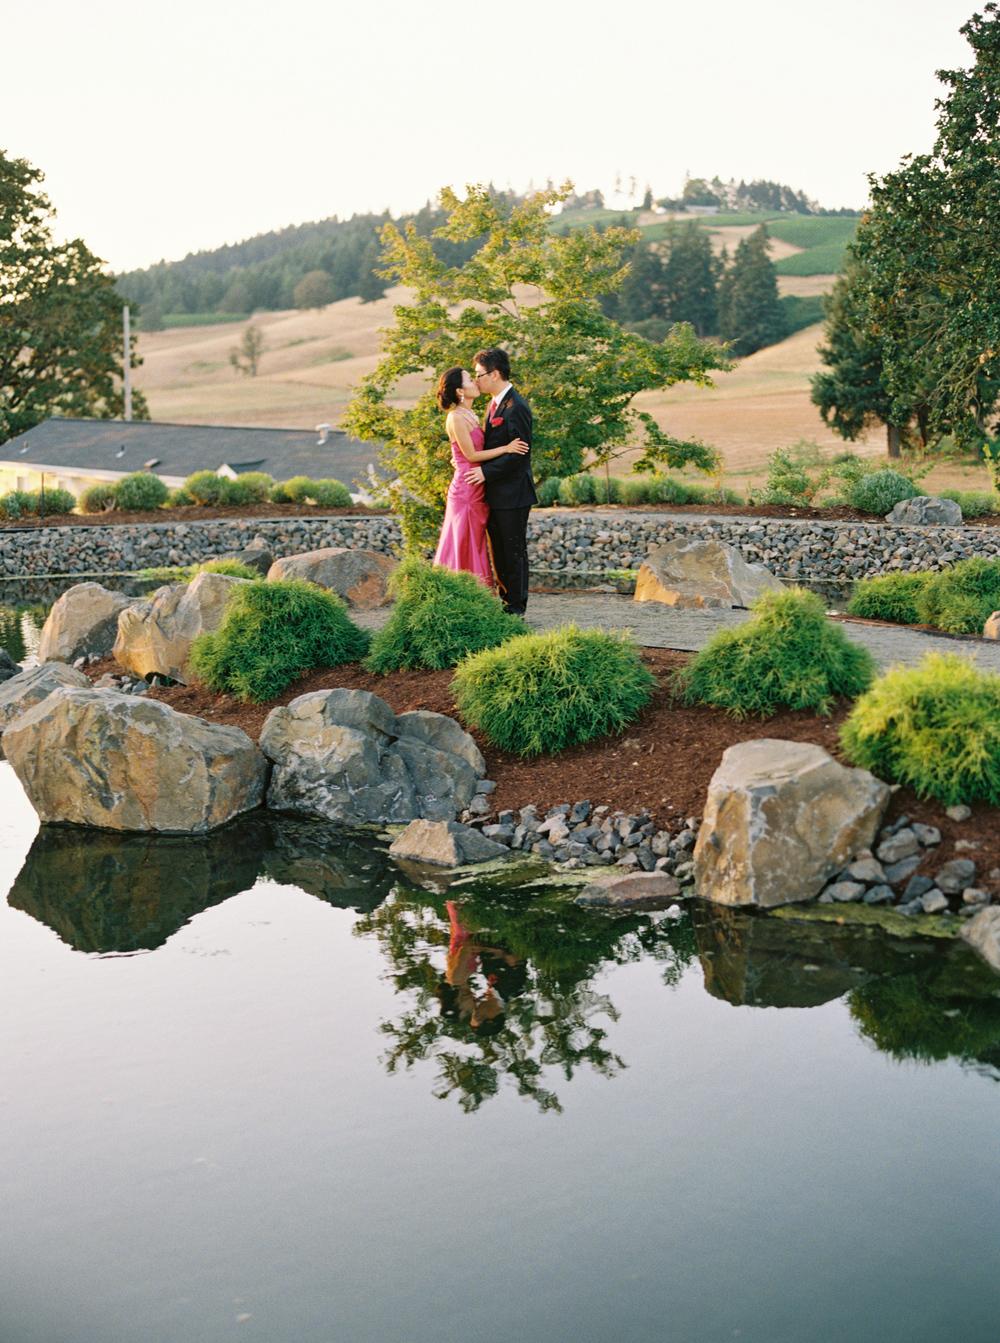 053+Saffron+Fields+Oregon+Fine+Art+Wedding+Photographer+Outlive+Creative.jpg